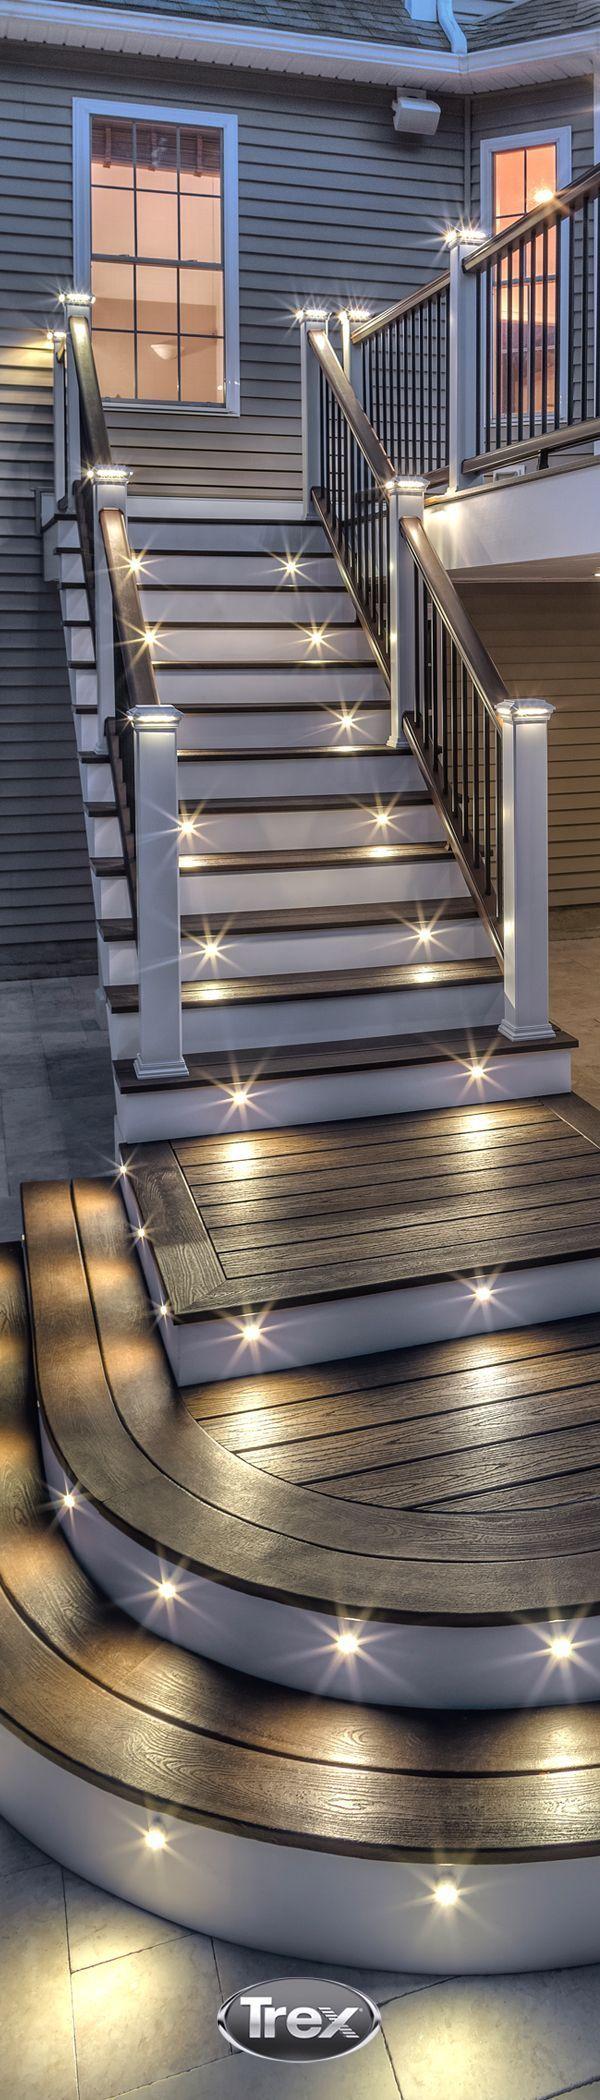 Lighting Basement Washroom Stairs: Best 25+ Deck Lighting Ideas On Pinterest